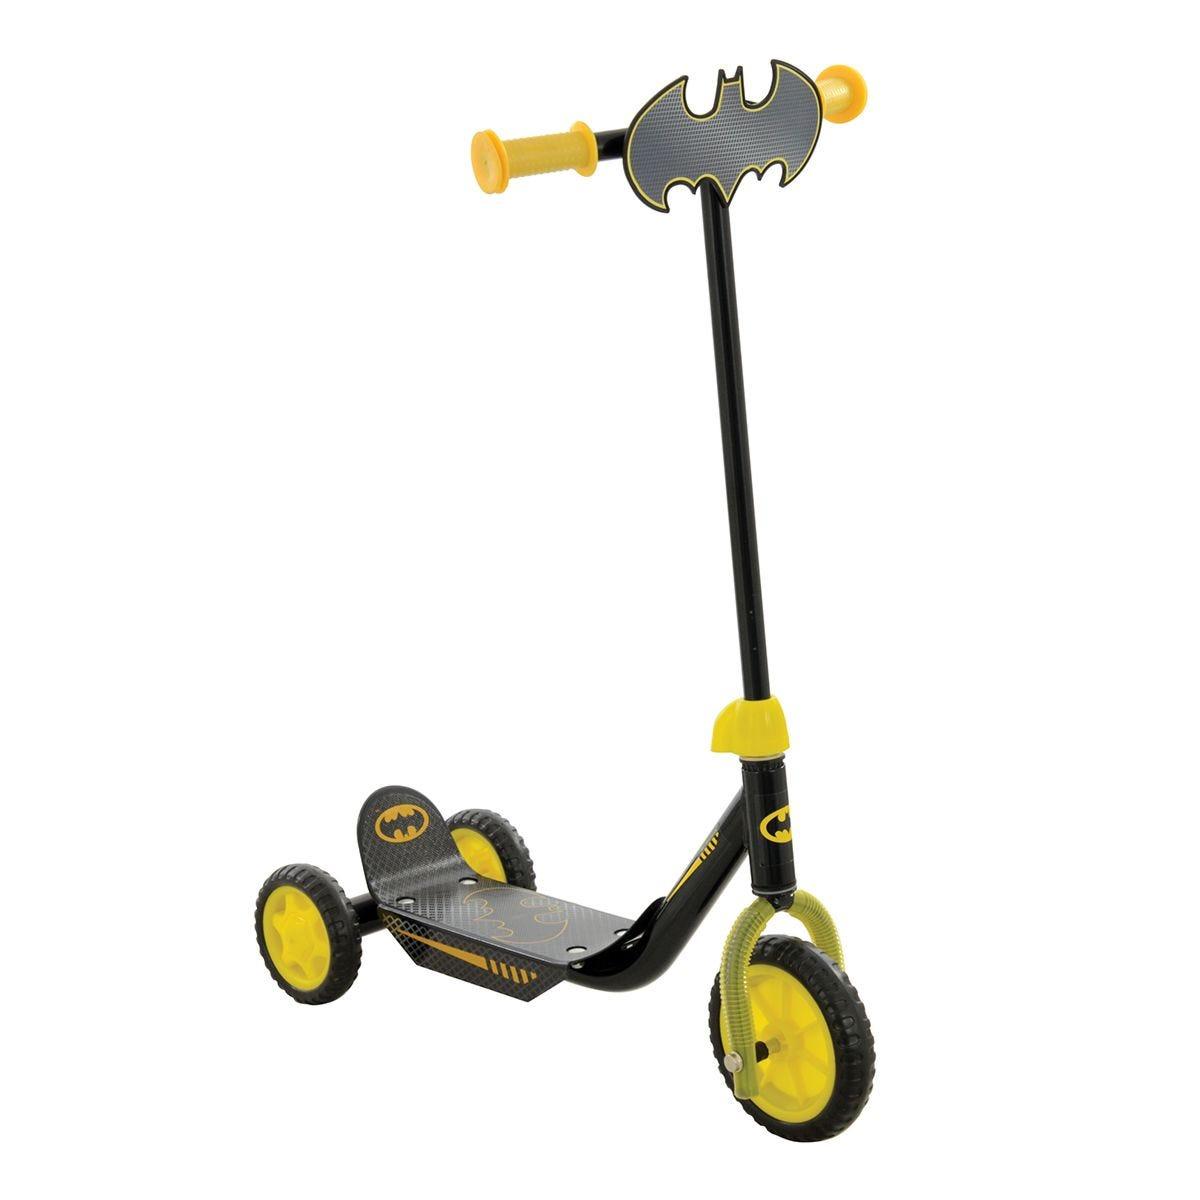 Batman Deluxe Tri Scooter